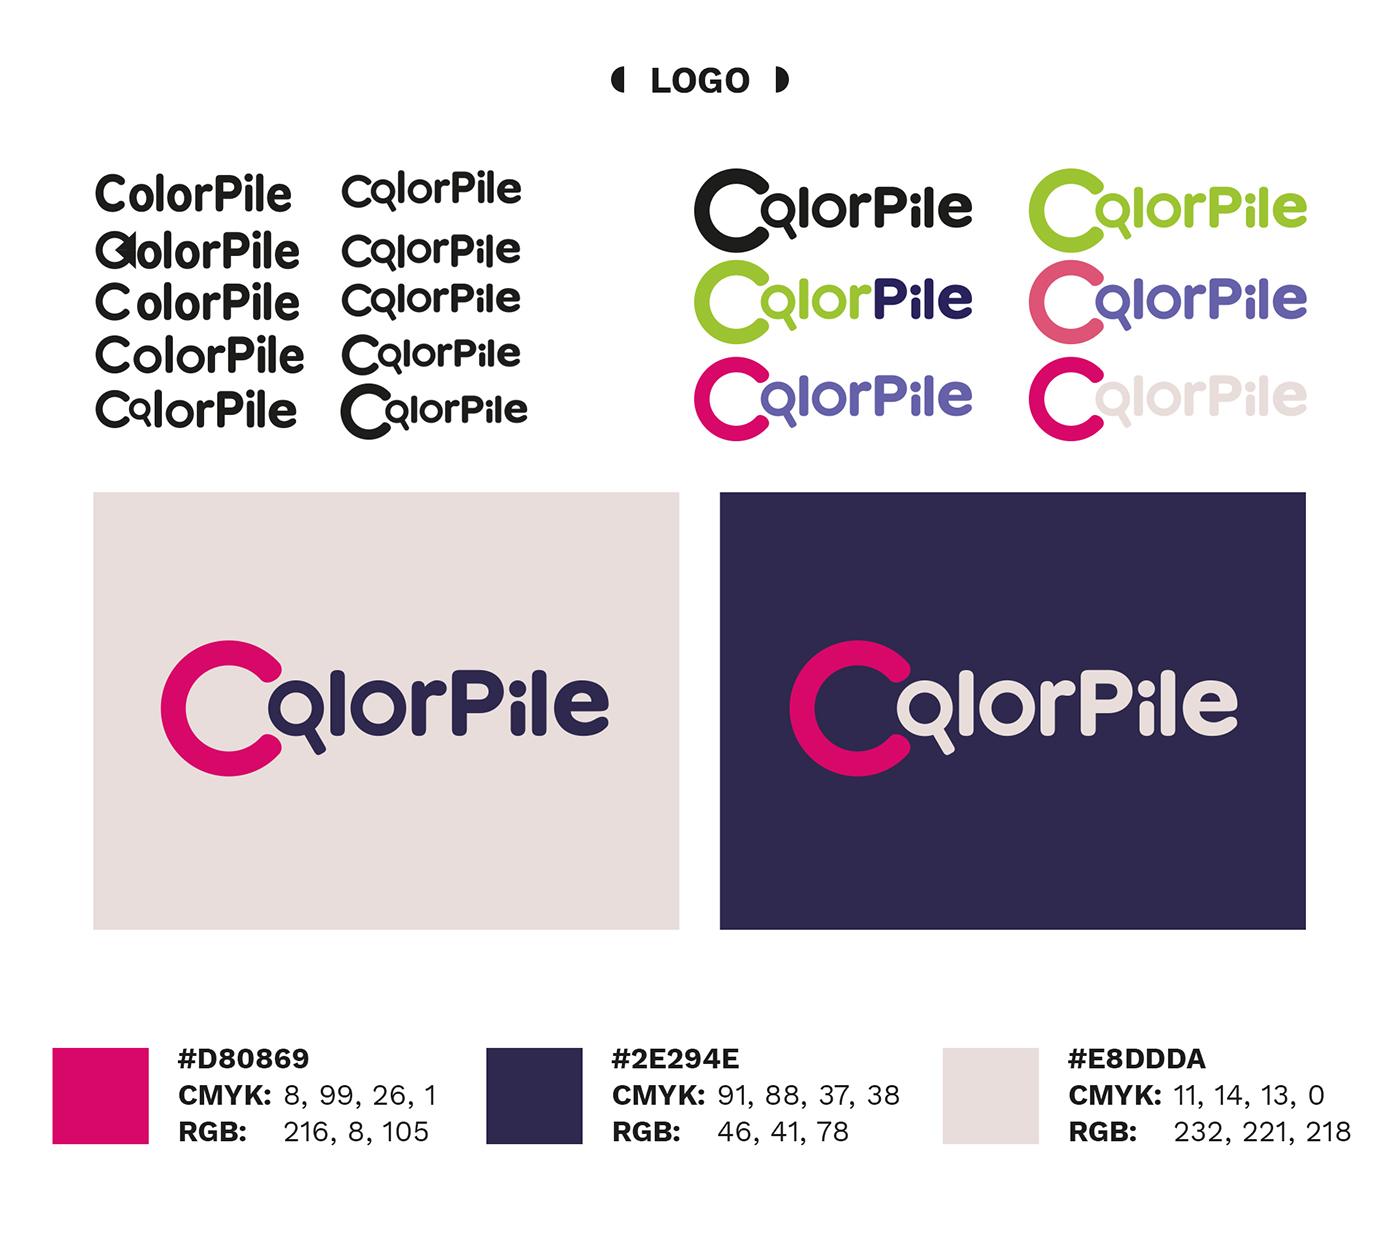 software Programm C# graphic design  logo Visual Studio